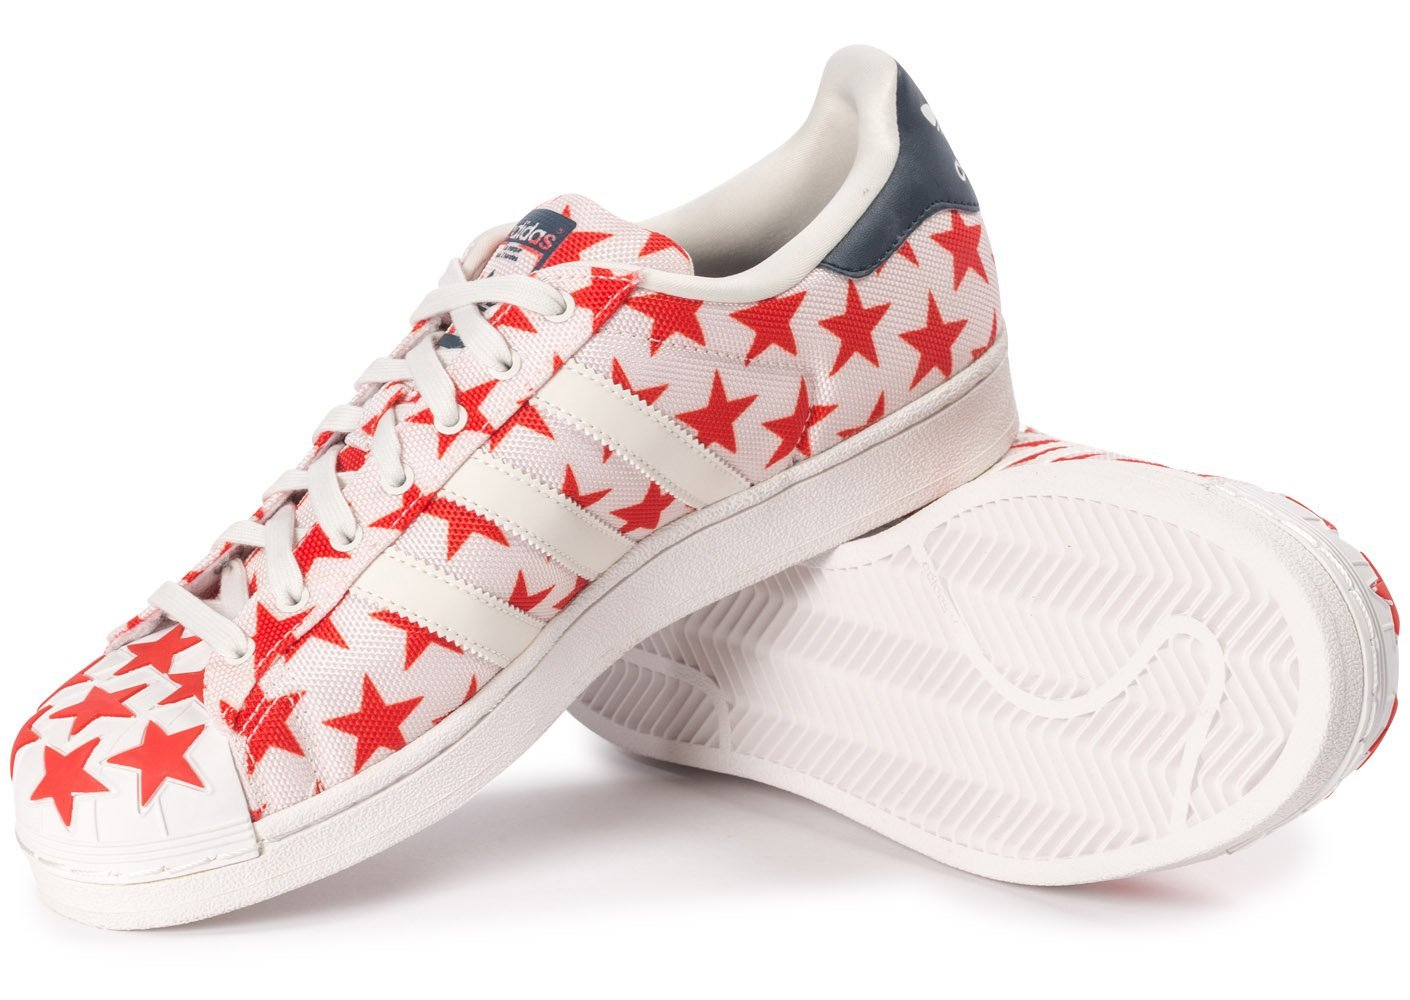 Adidas - Superstar Shell Toe Pack - Colore: Bianco-Blu marino-Rosso - Taglia: 41.3